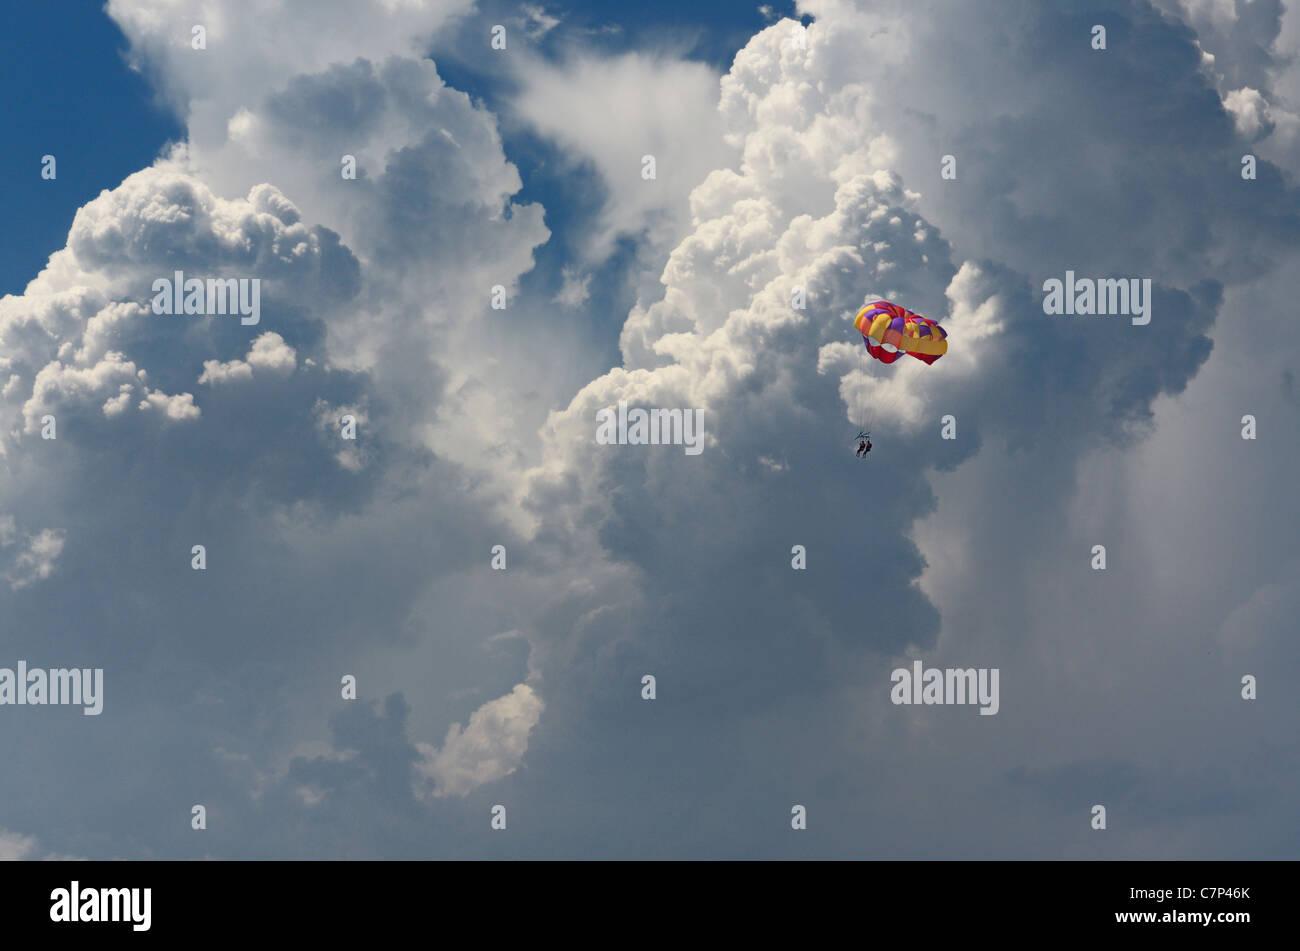 Pair of tourists parasailing against cumulonimbus clouds in Mexico - Stock Image